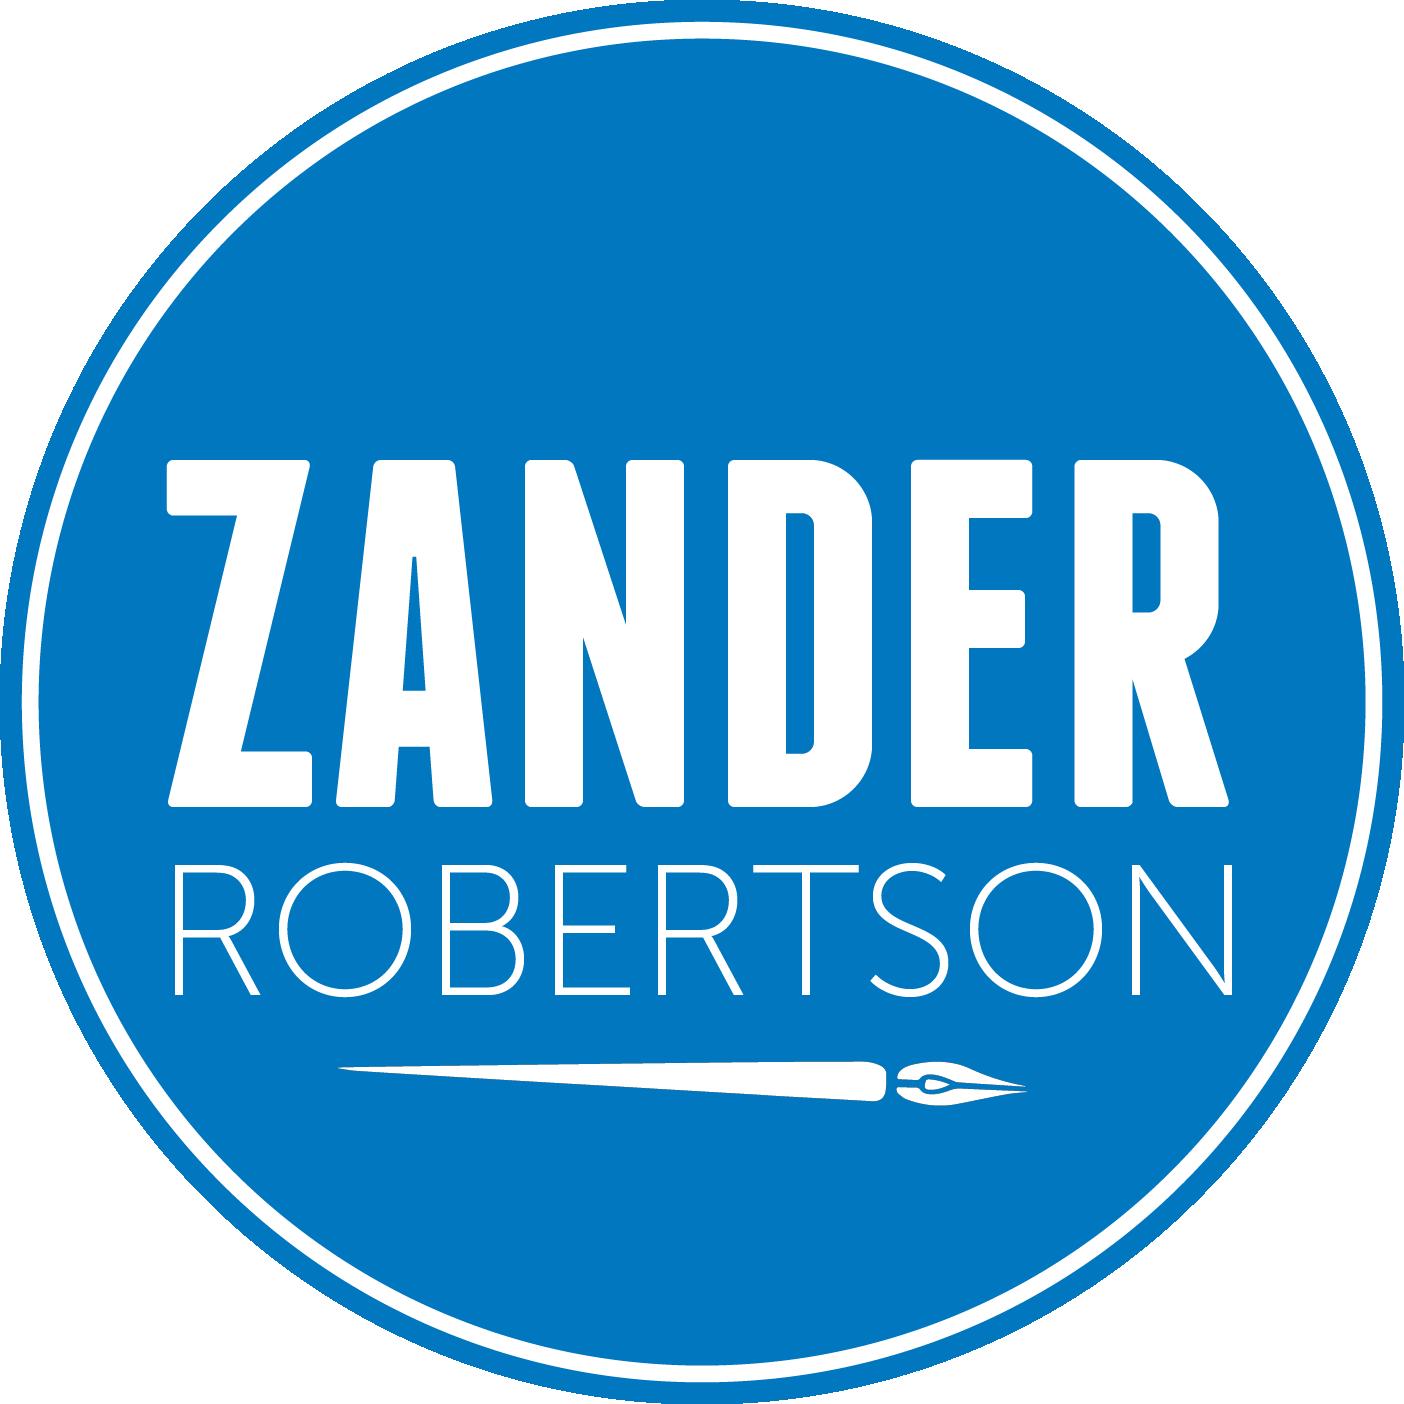 Zander Robertson